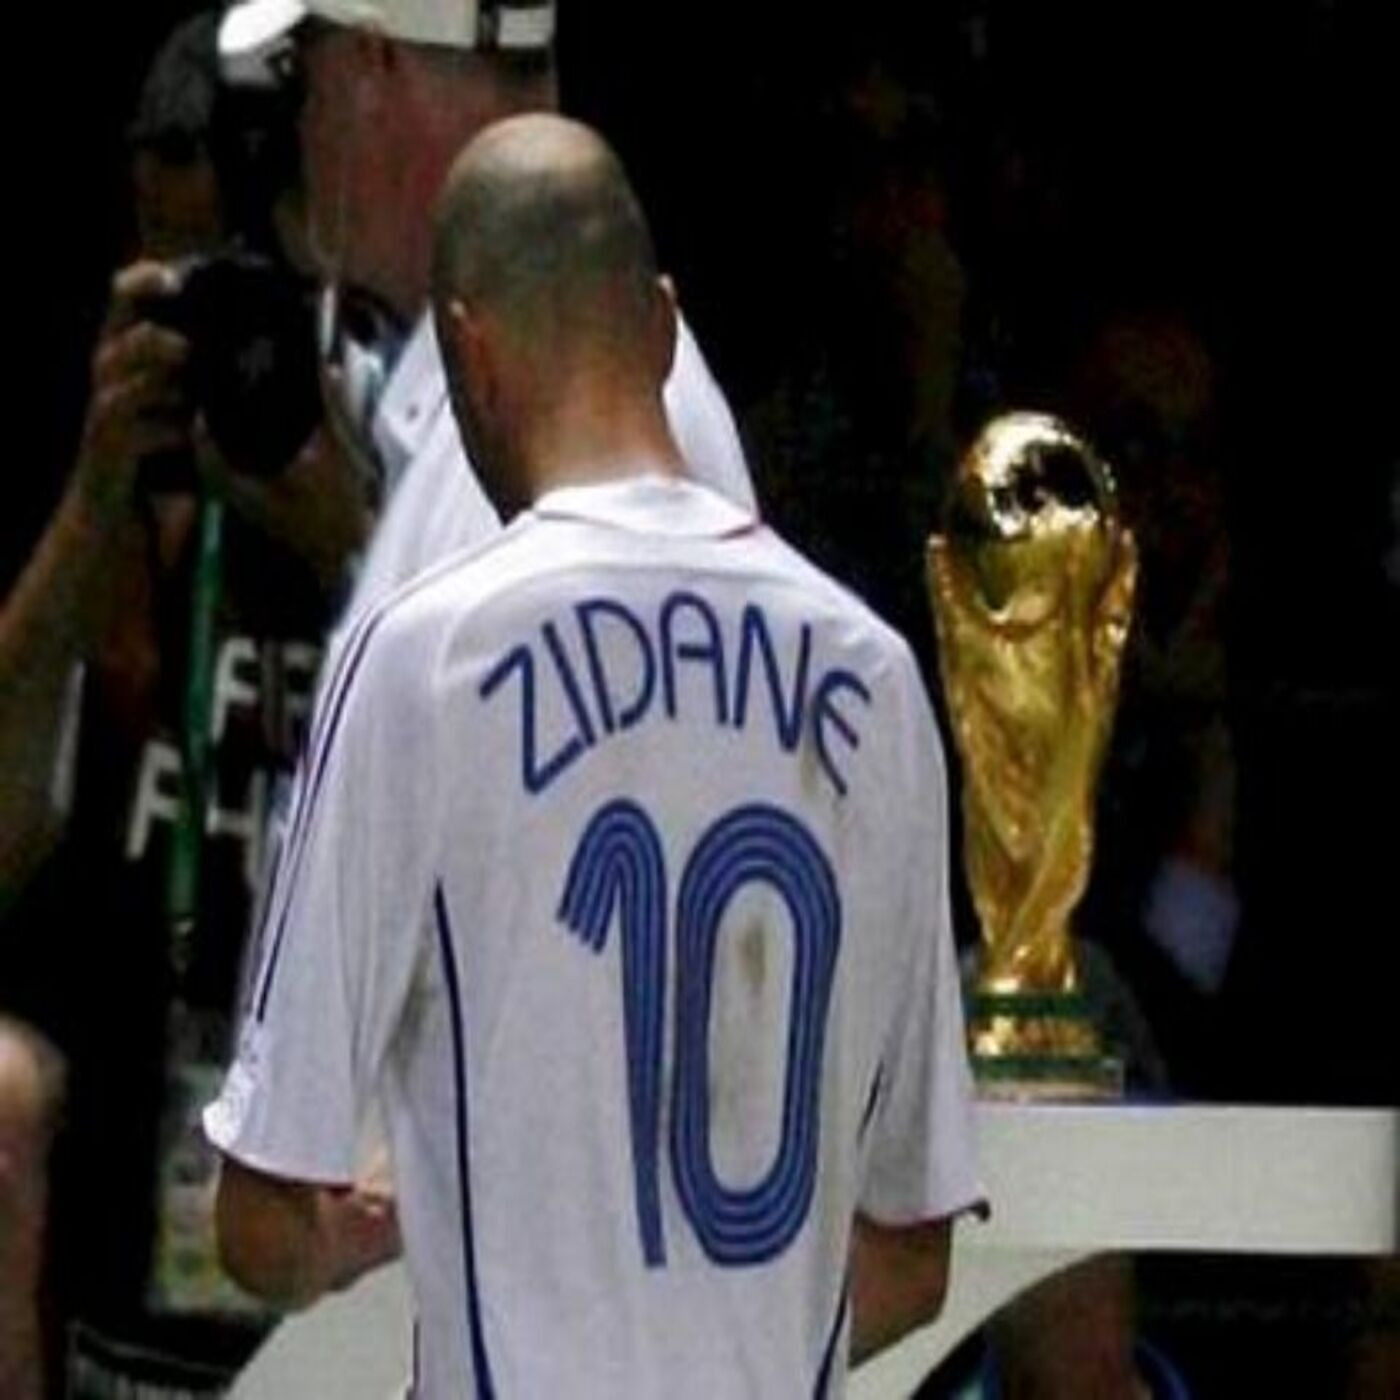 Quand Zidane a disjoncté en 2006